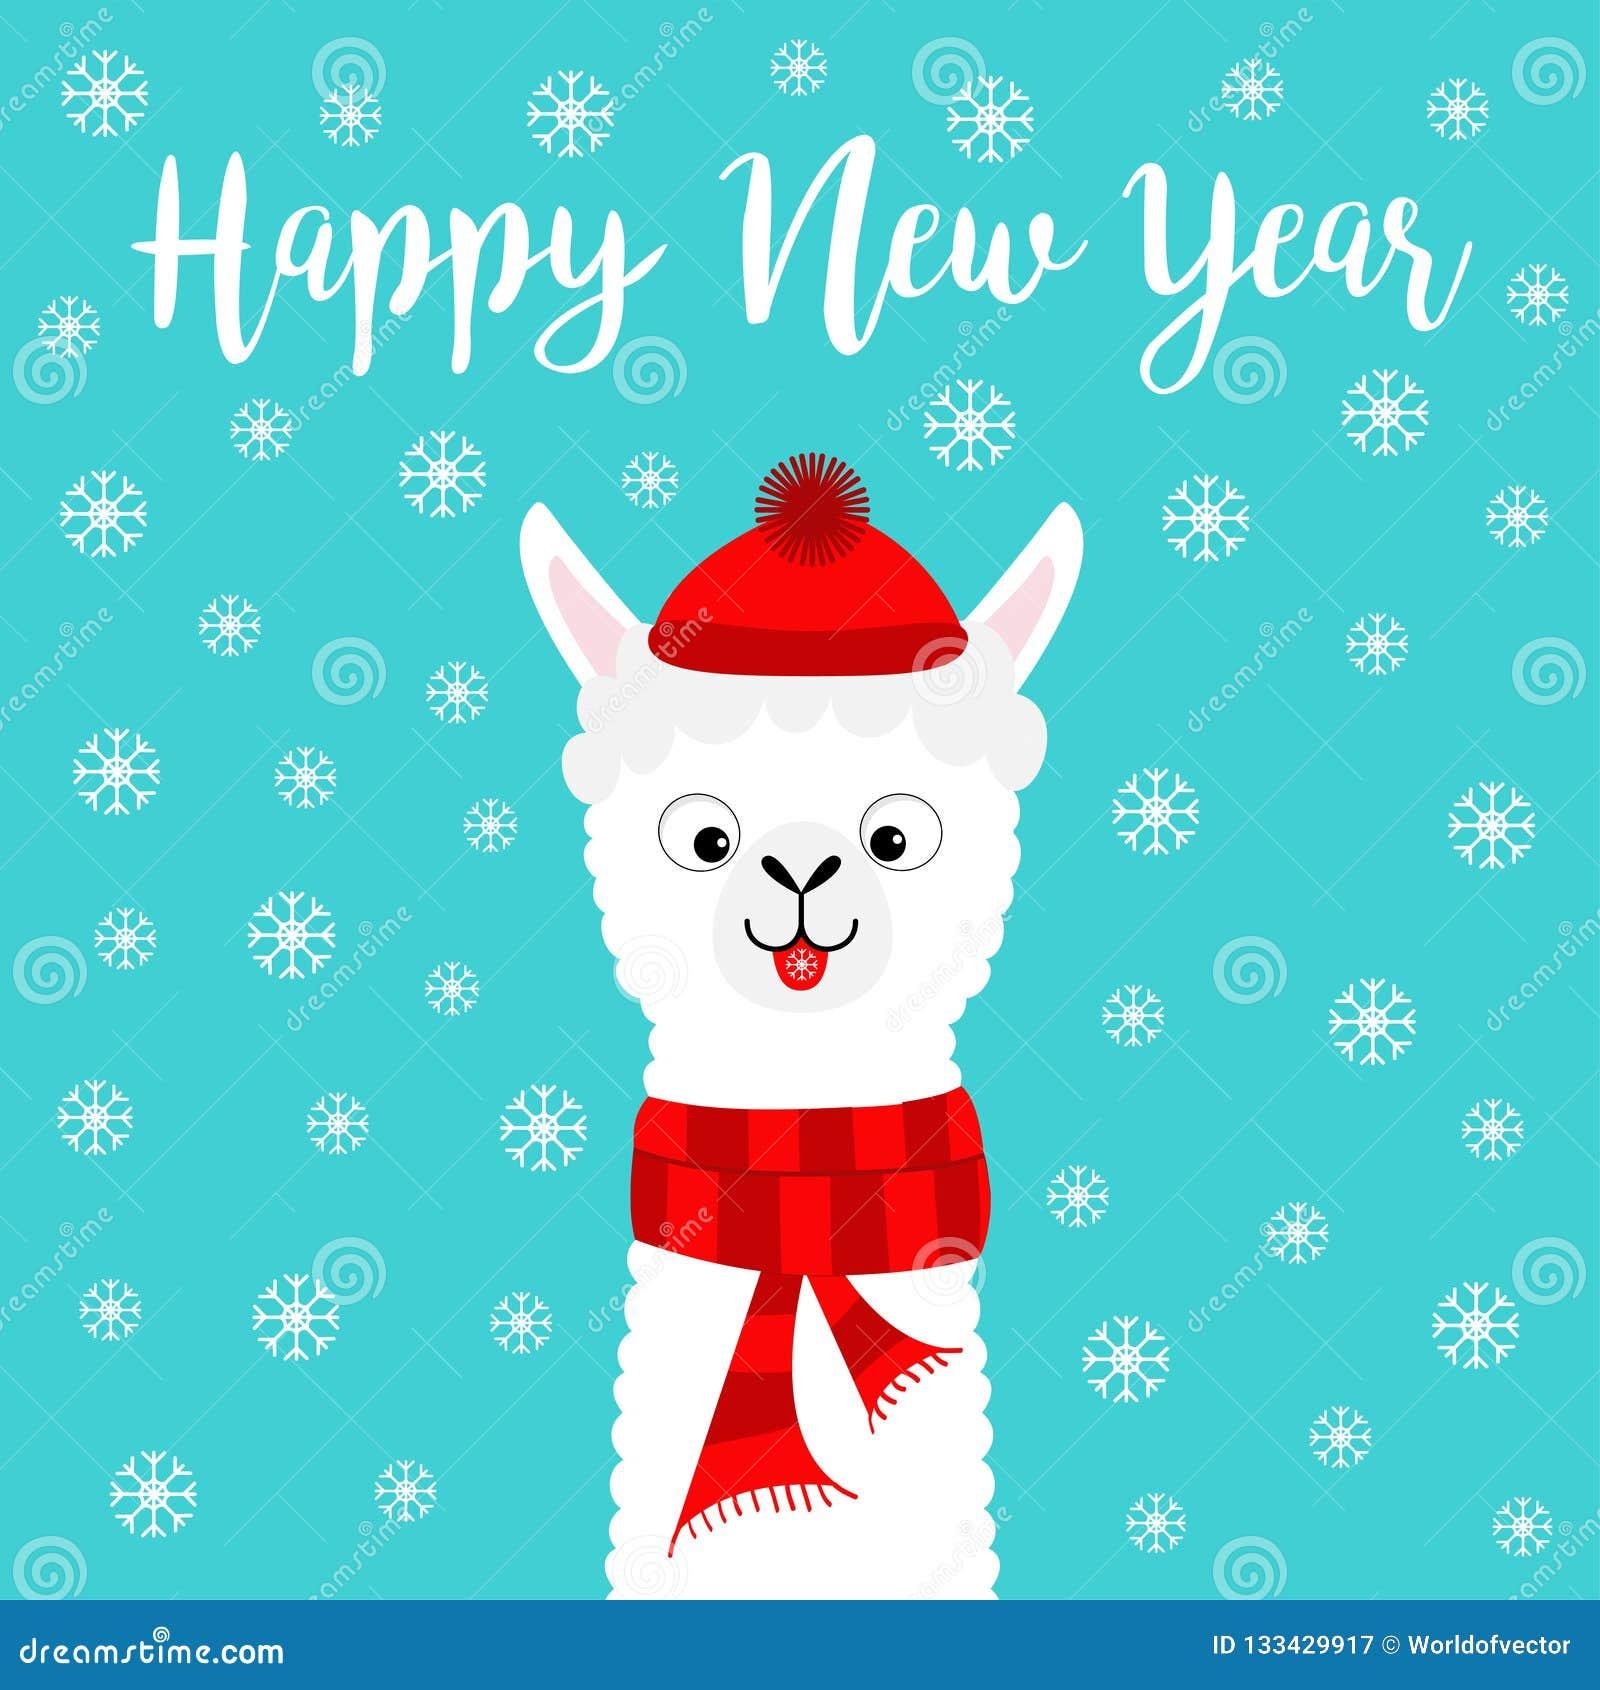 891334d7ac026 Happy New Year. Llama Alpaca Baby Face Neck. Santa Claus Red Hat ...